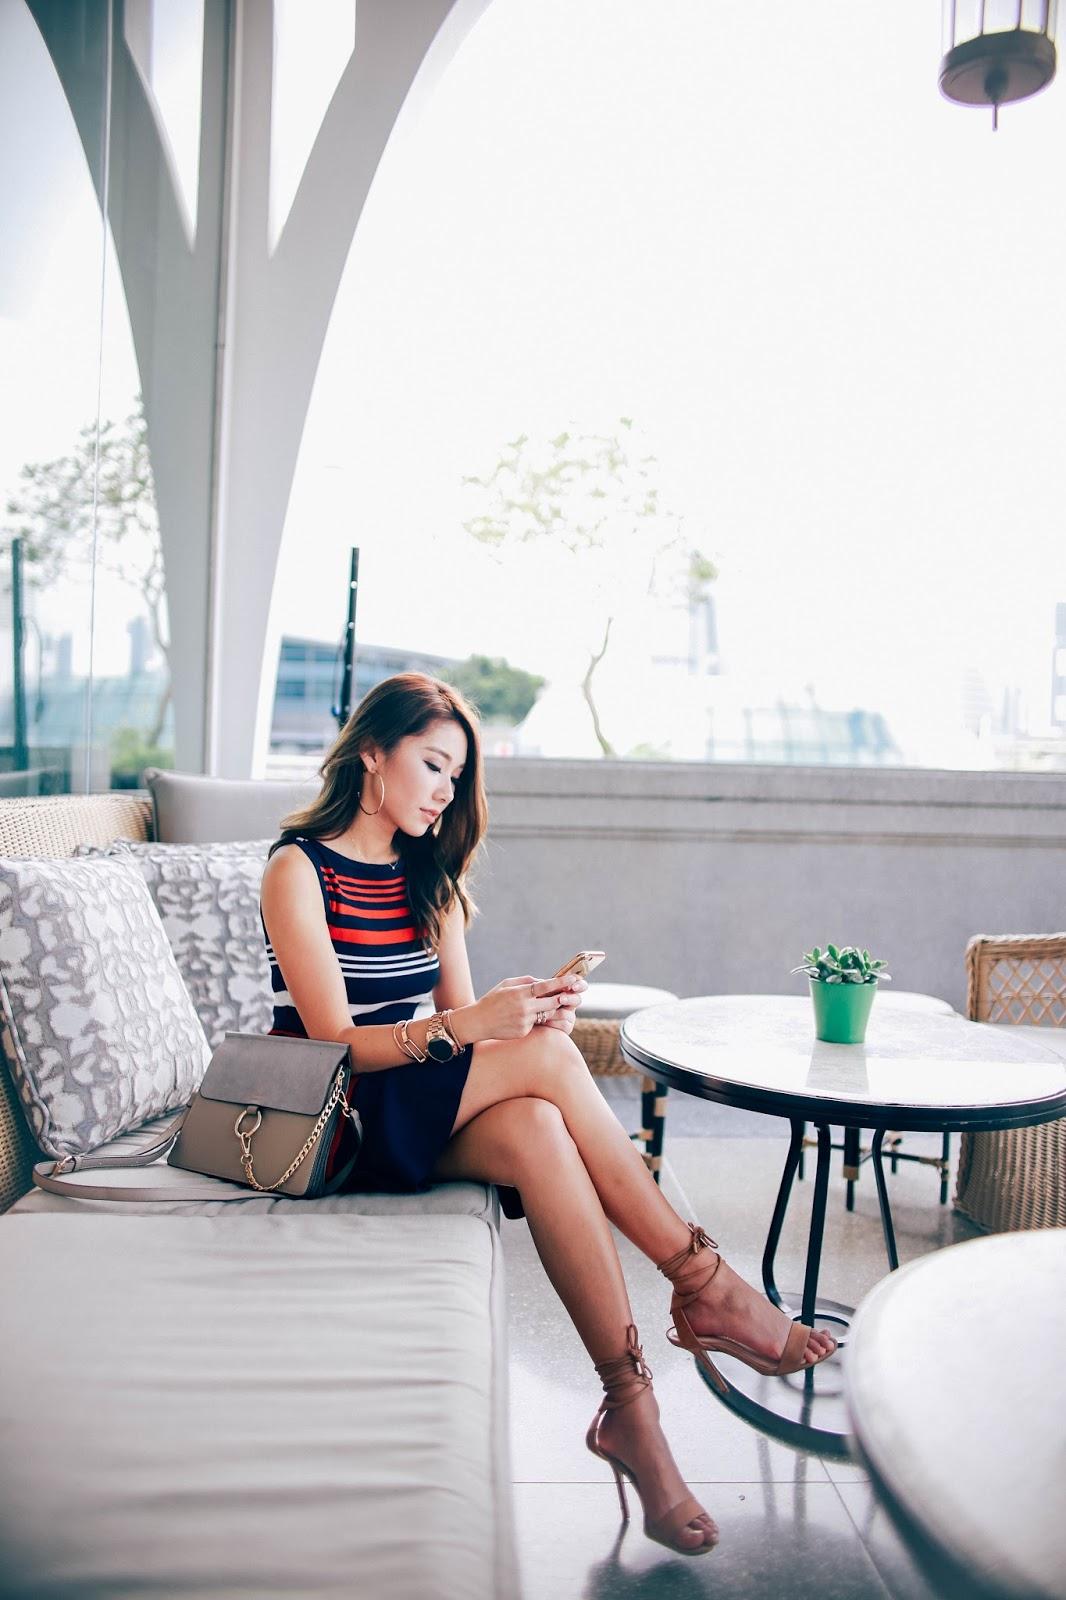 the clifford pier, fullerton bay, singapore, fashion, blog, fall 2016, michael kors, access